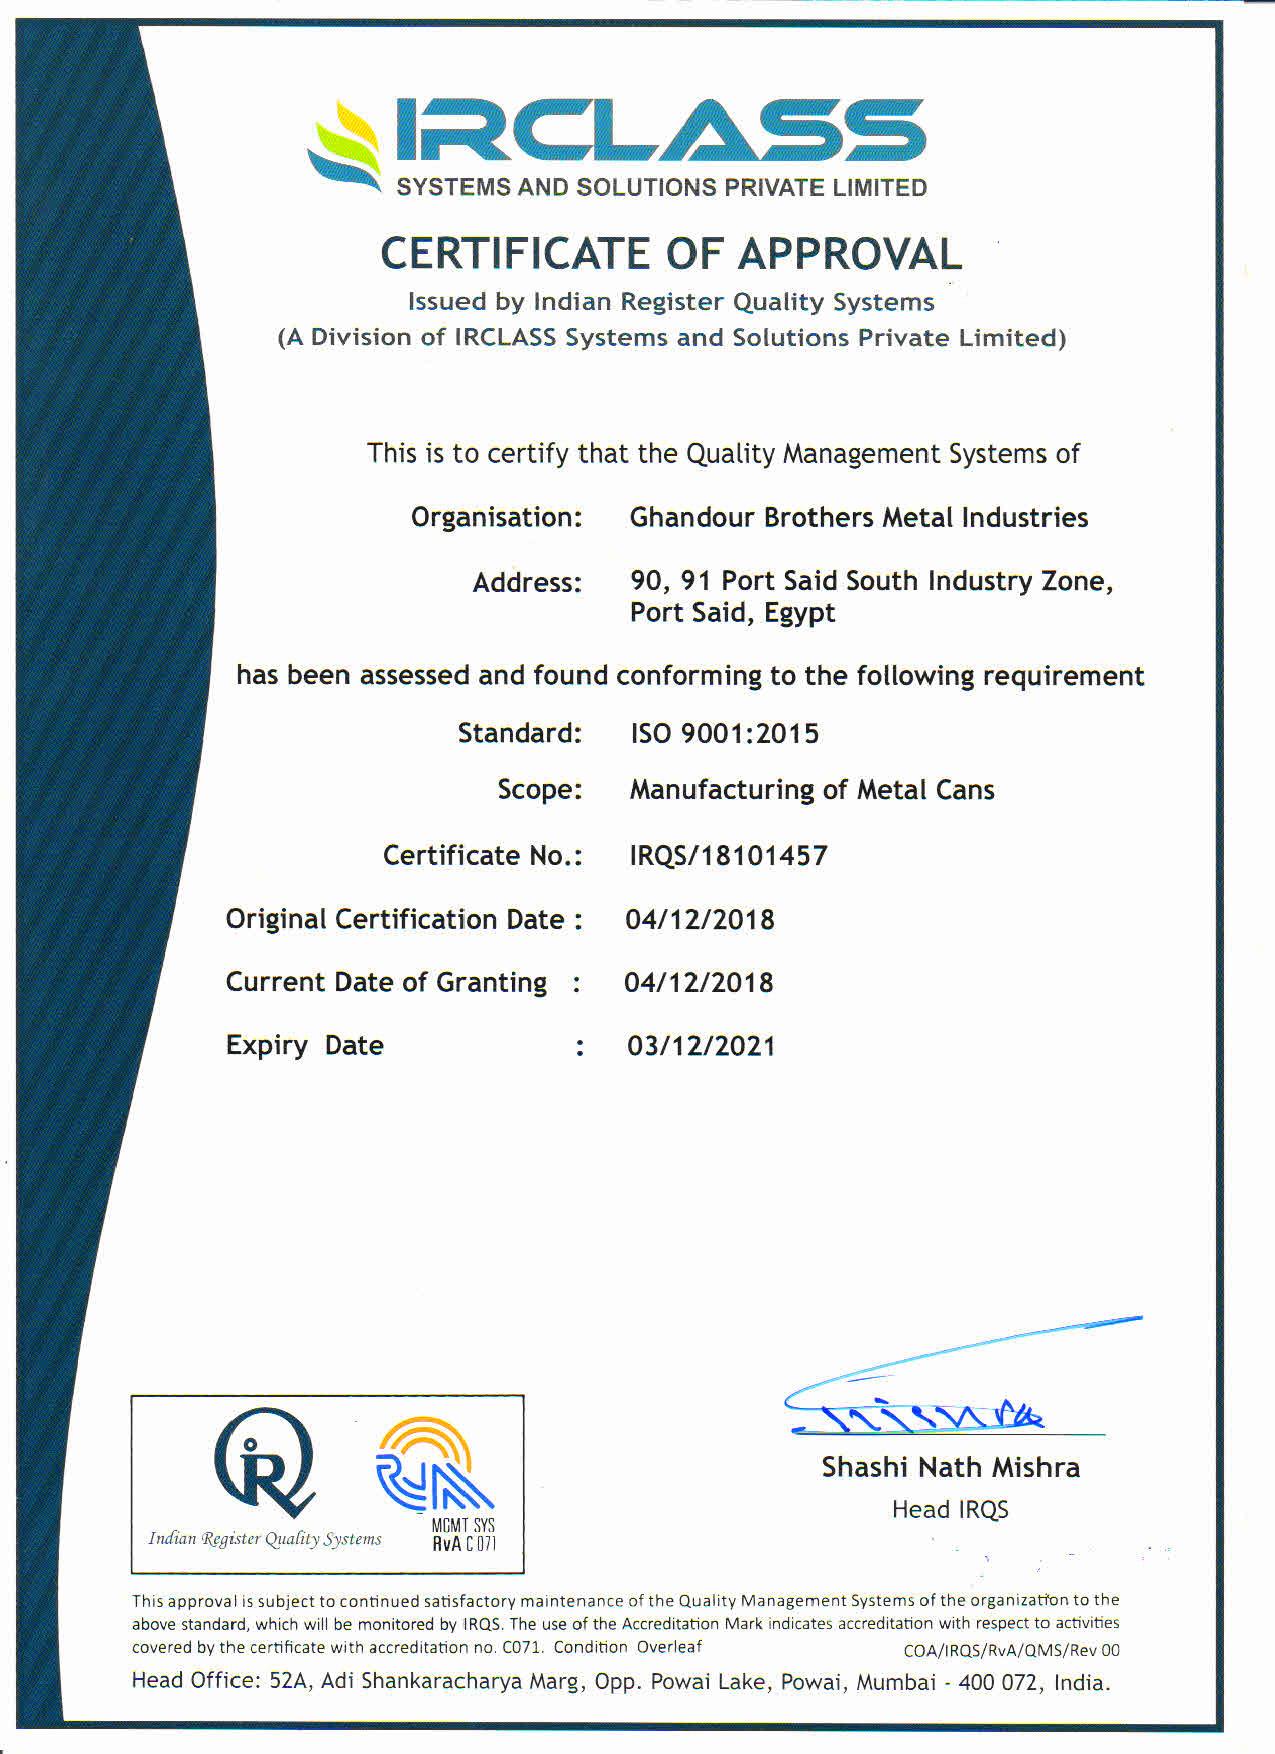 ISO 9001 Certificates